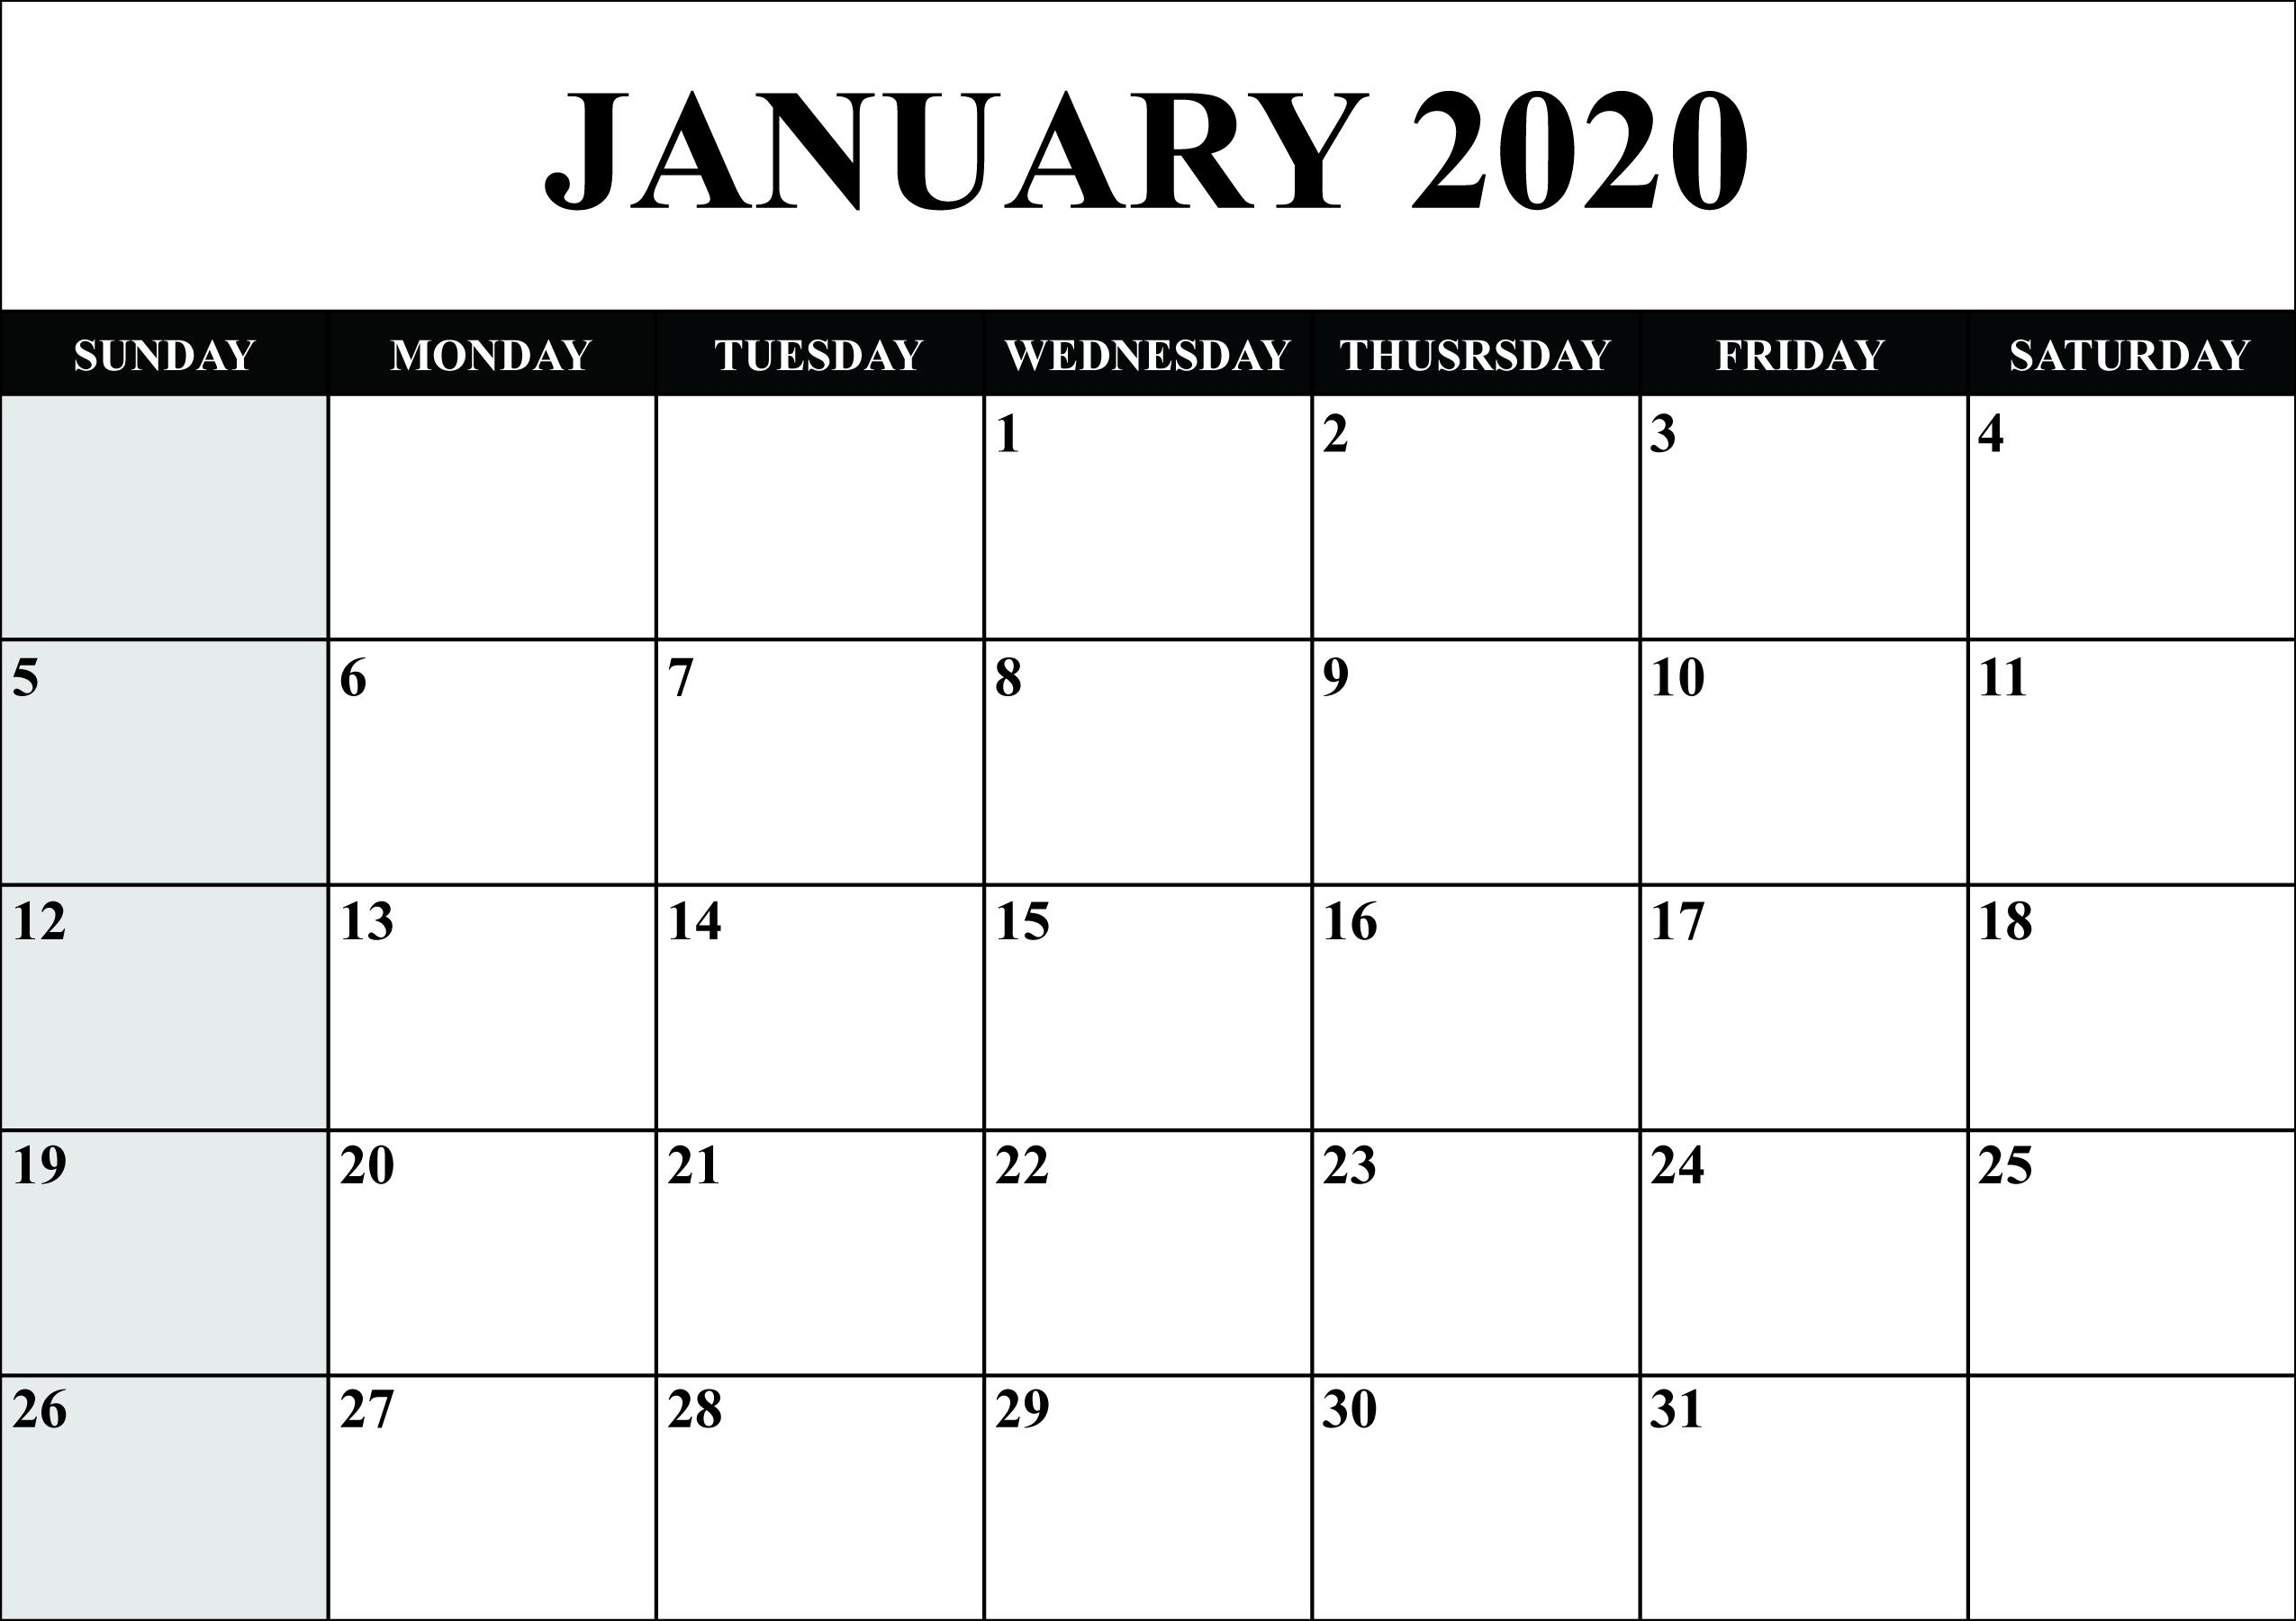 Free Blank January 2020 Calendar Printable In Pdf, Word-January 2020 Calendar Excel